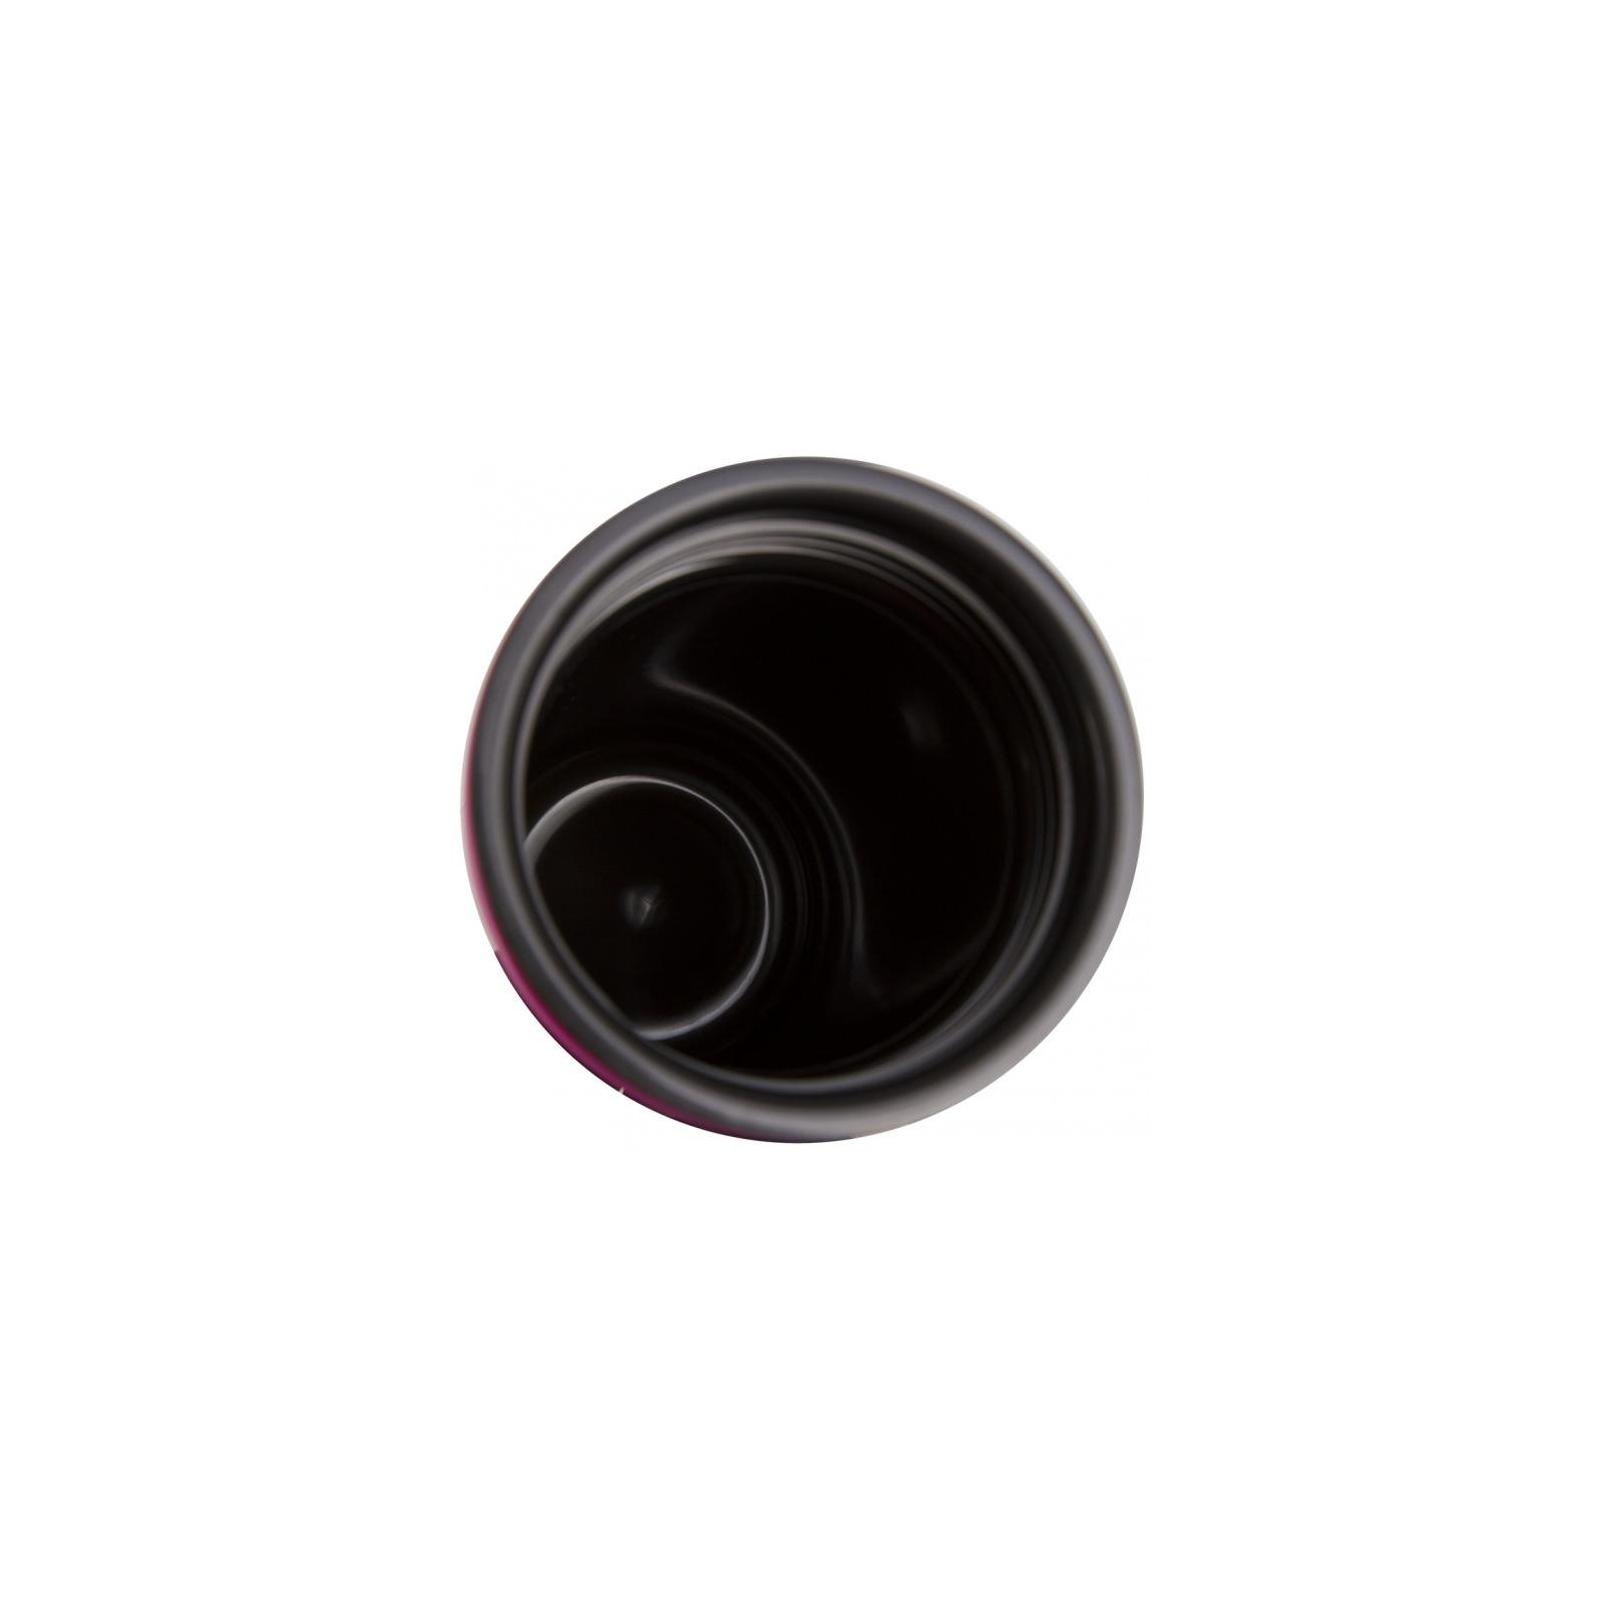 Термокружка Tefal TRAVEL MUG FUN 0.36L white (K3070114 white) изображение 5